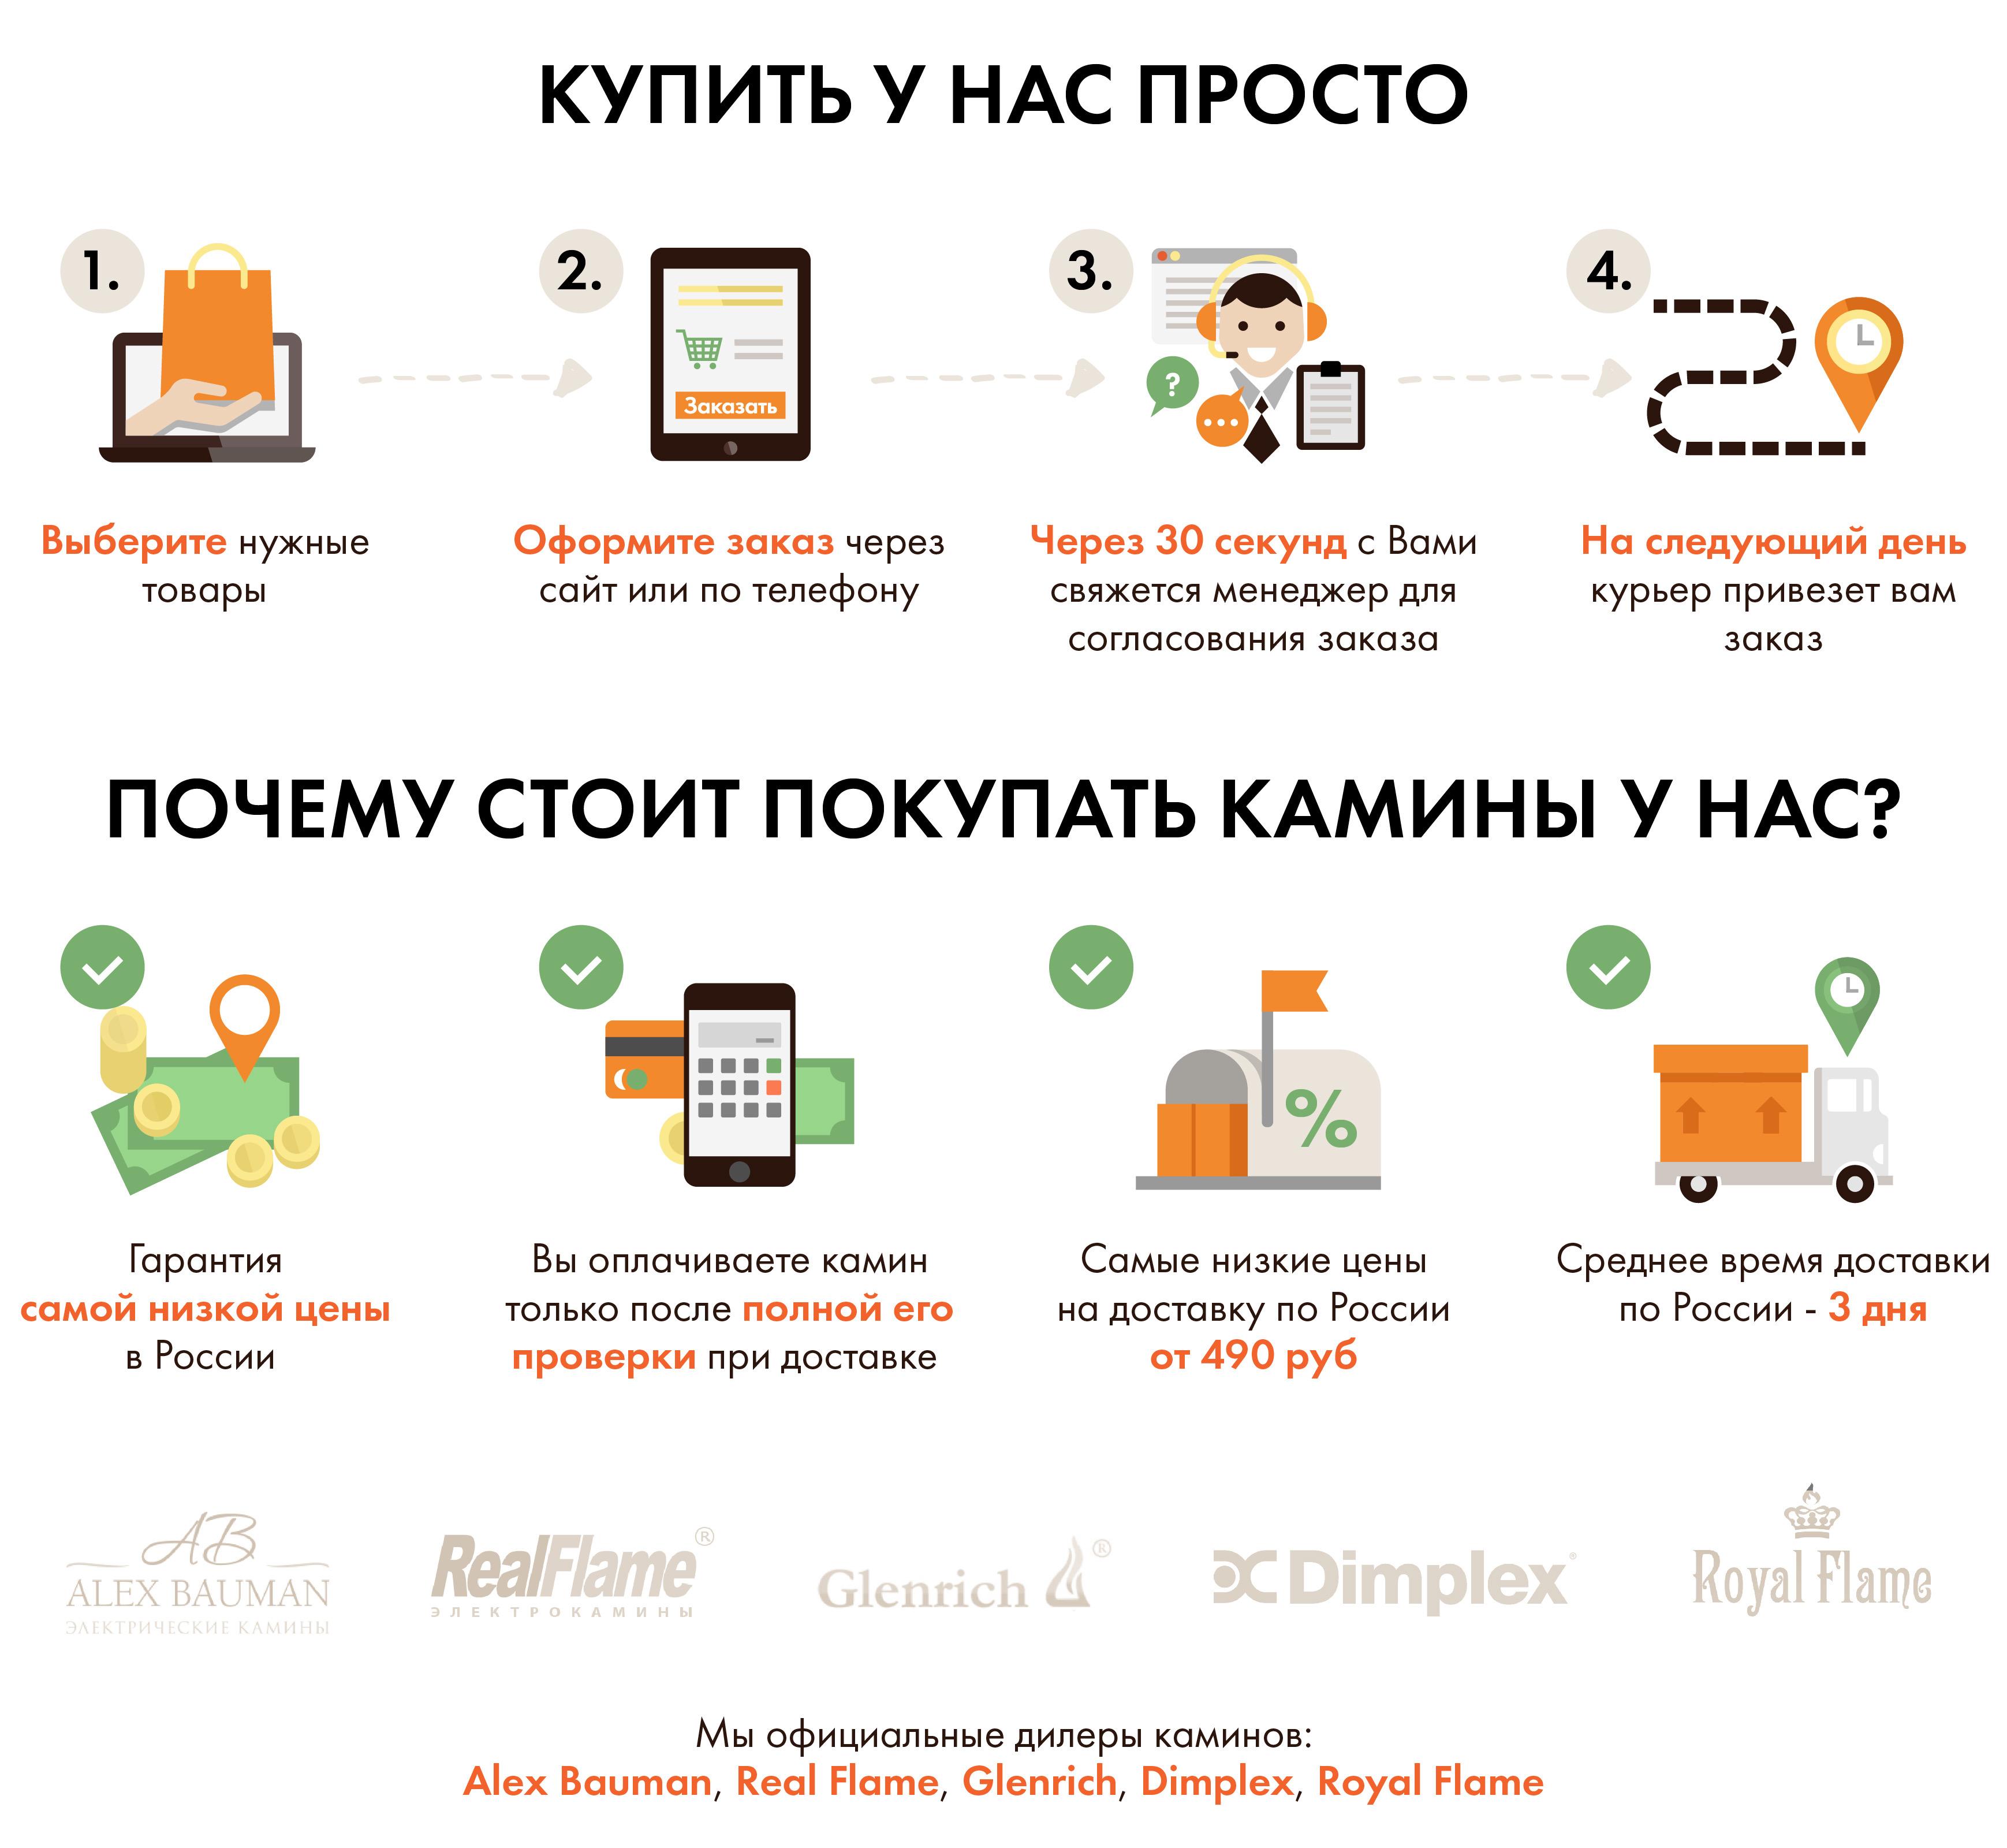 http://bio-kamin24.ru/images/upload/kupit_u_nas_prosto_bio.JPG